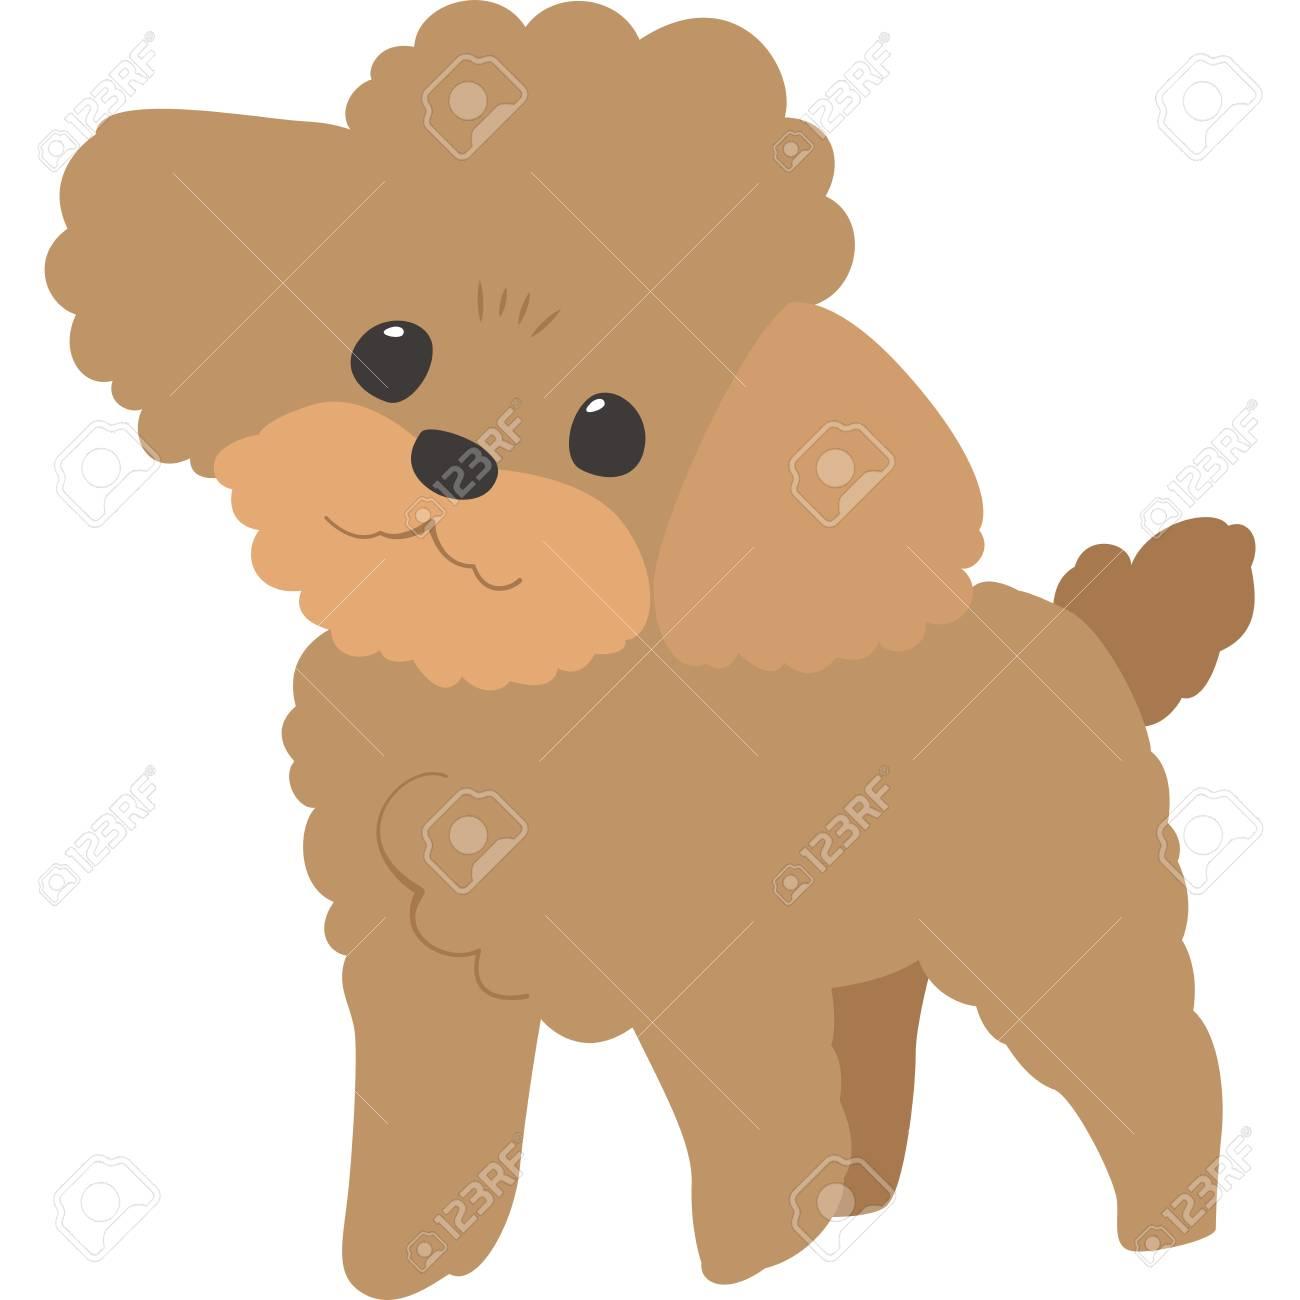 Poodle Clipart Poodle Dog - Pink Poodle Silhouette - Free Transparent PNG  Clipart Images Download